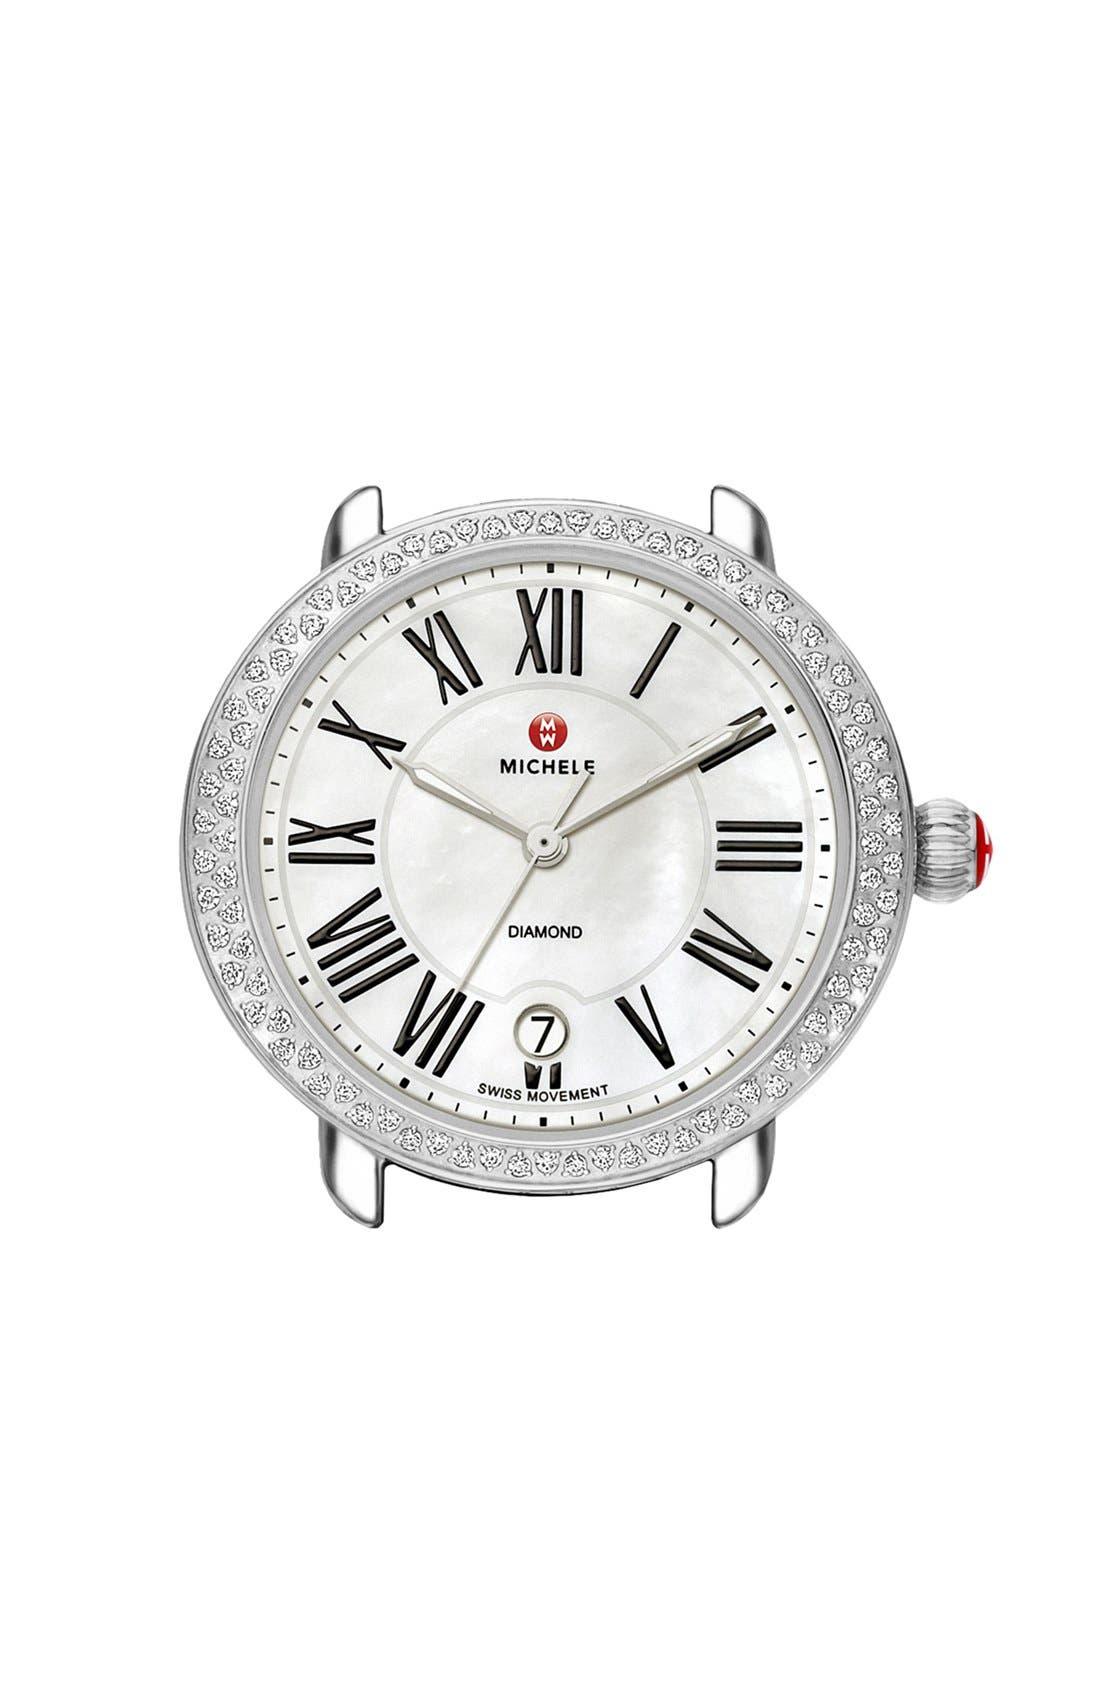 Main Image - MICHELE Serein 16 Diamond Gold Plated Watch Case, 34mm x 36mm